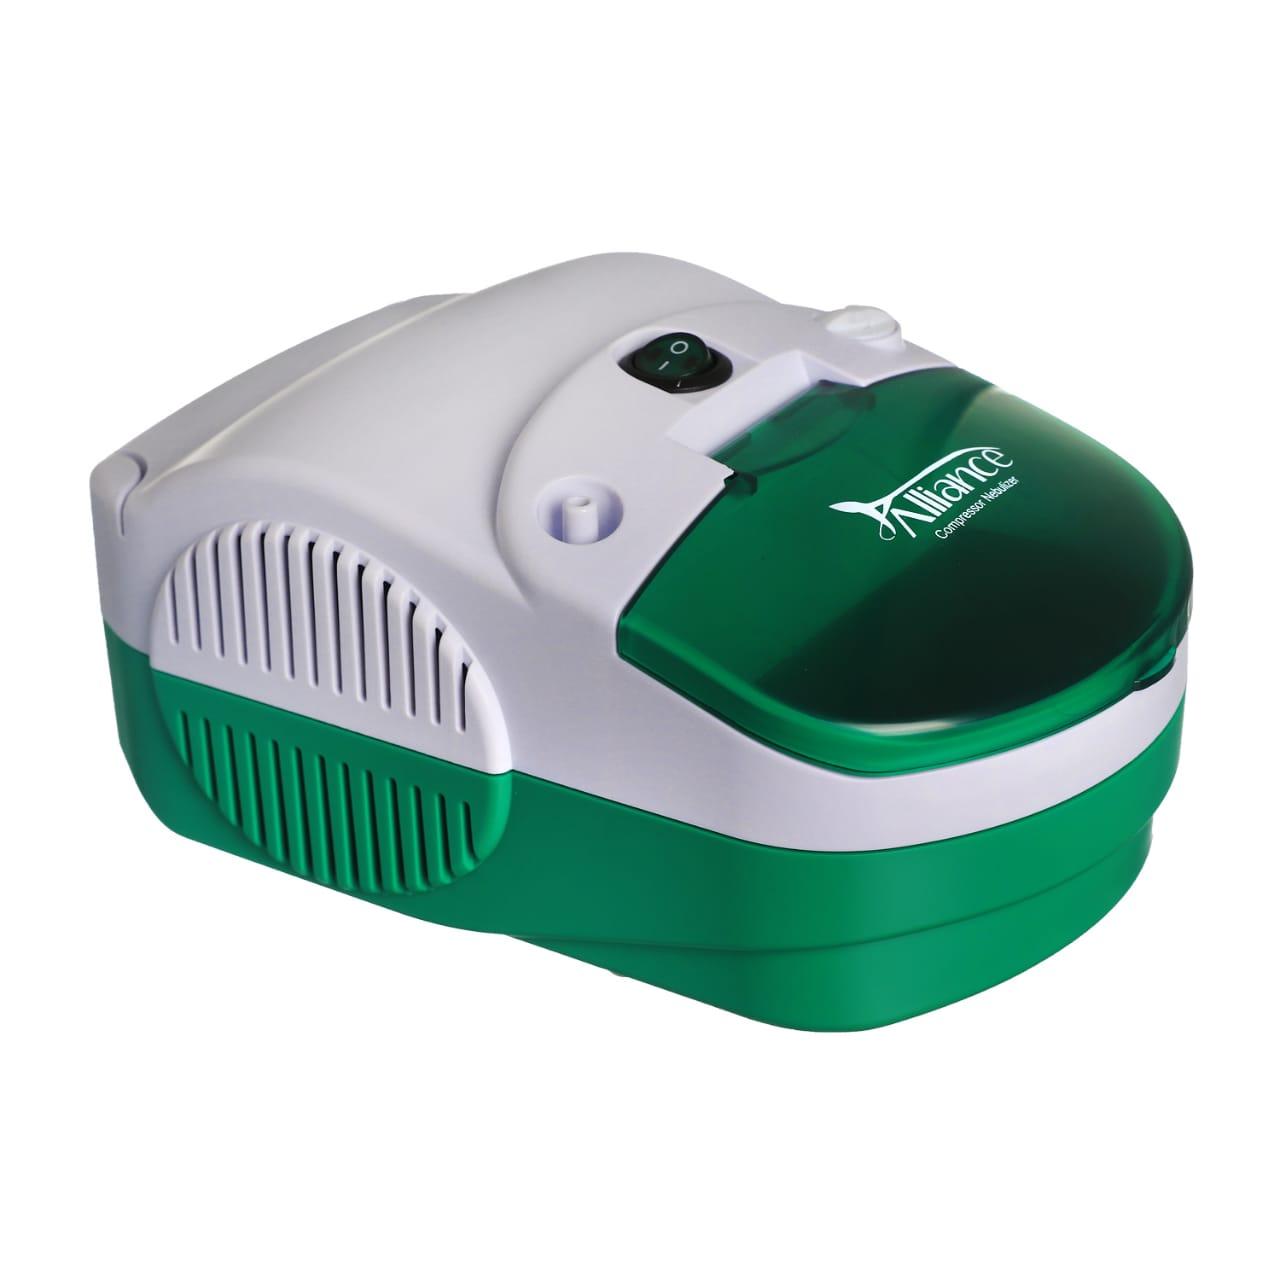 Alliance nebulizer device